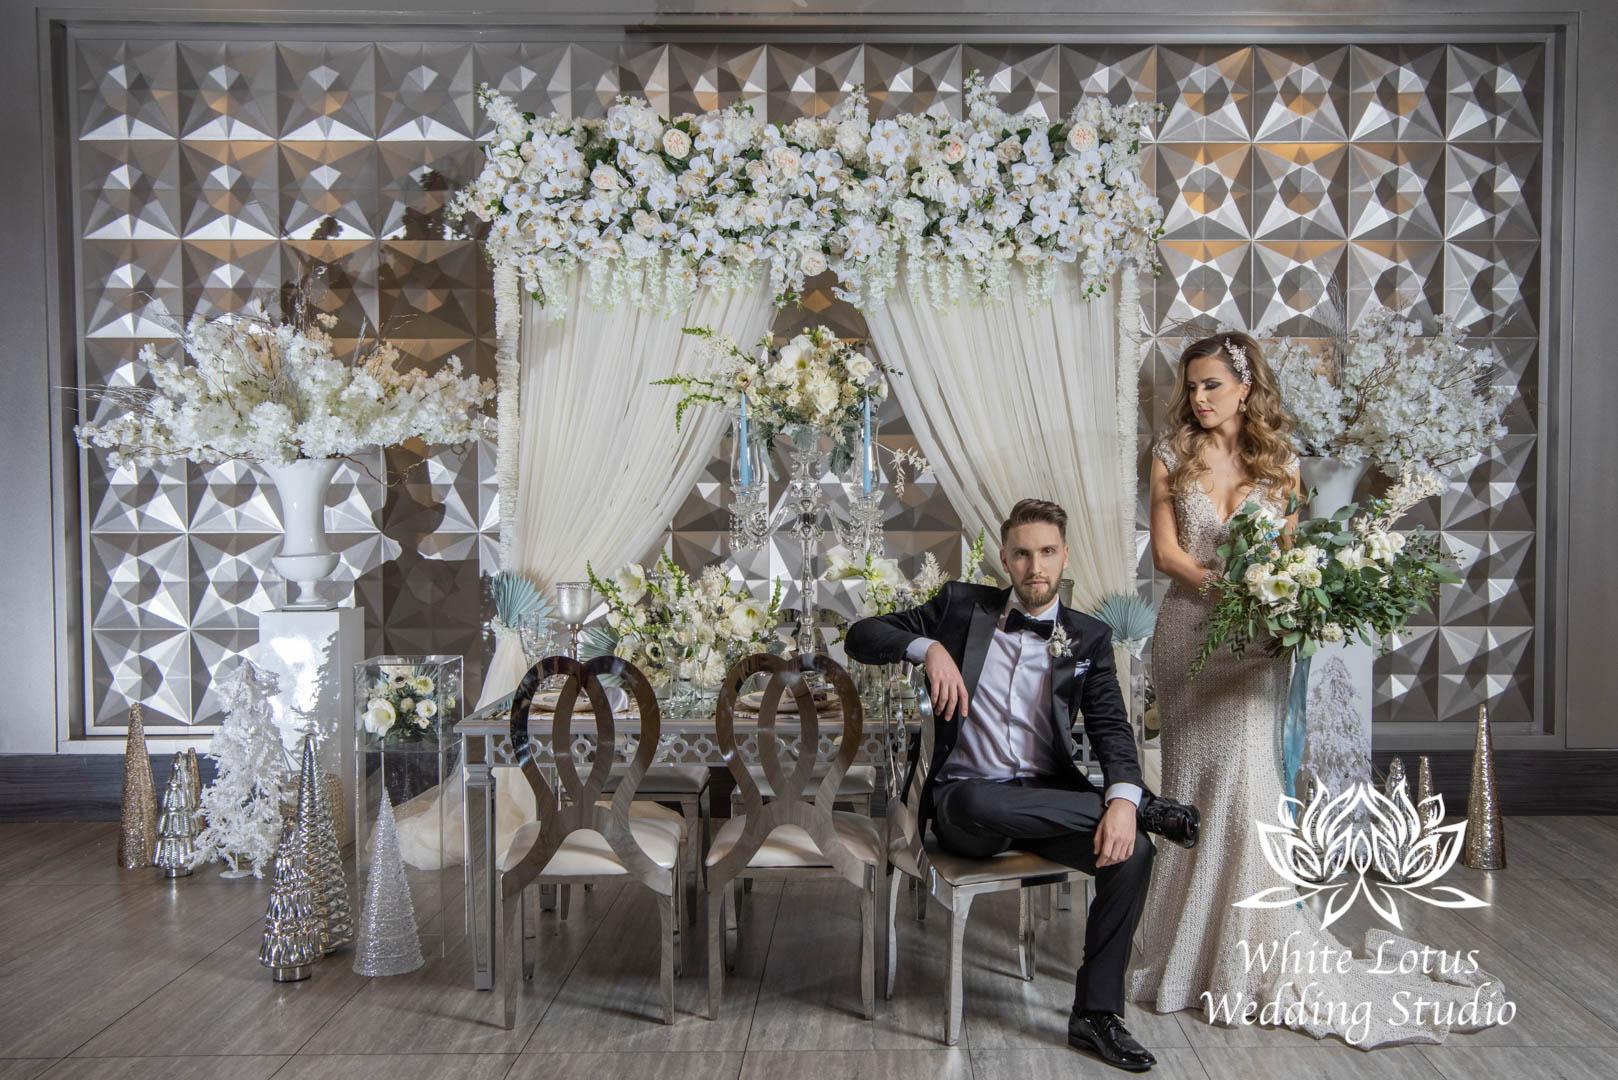 145- GLAM WINTERLUXE WEDDING INSPIRATION